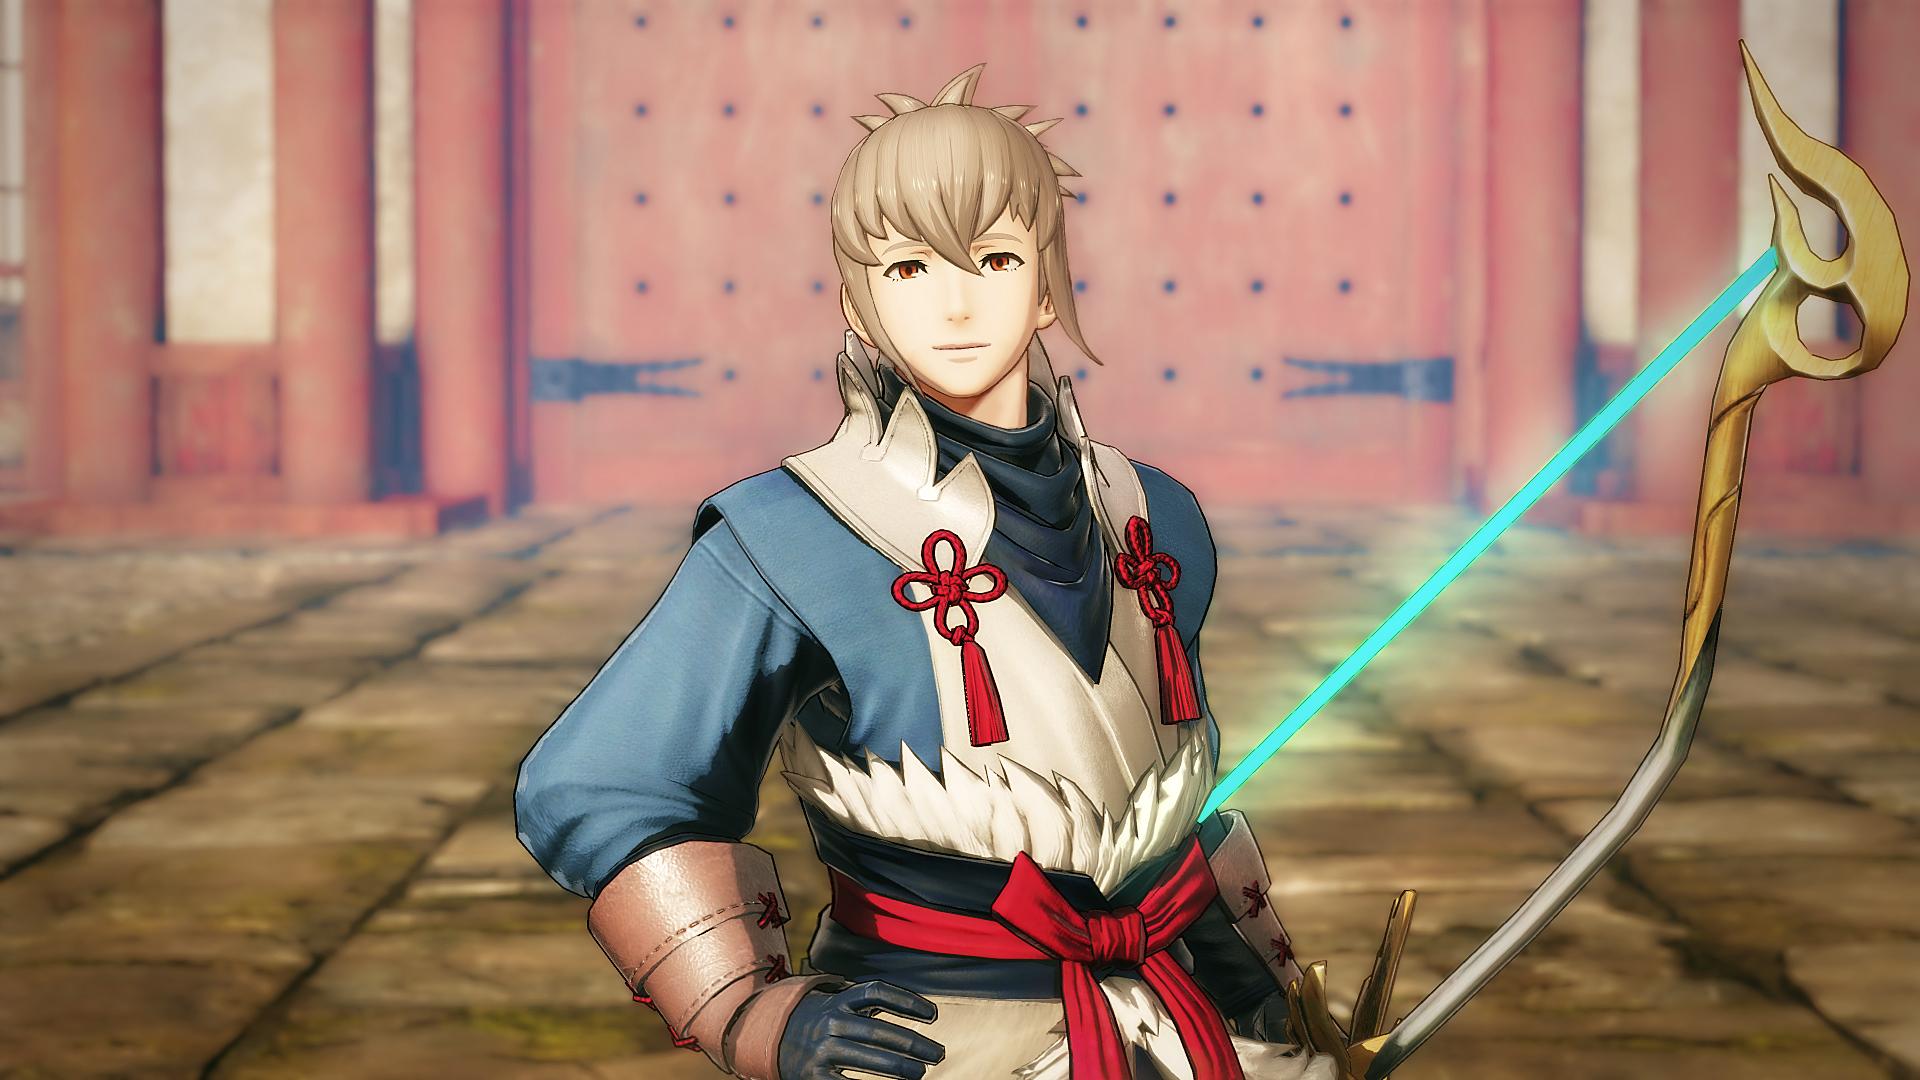 Fire-Emblem-Warriors-muestra-a-Hinoka-Takui-Camilla-Leo-y-algunos-detalles-4